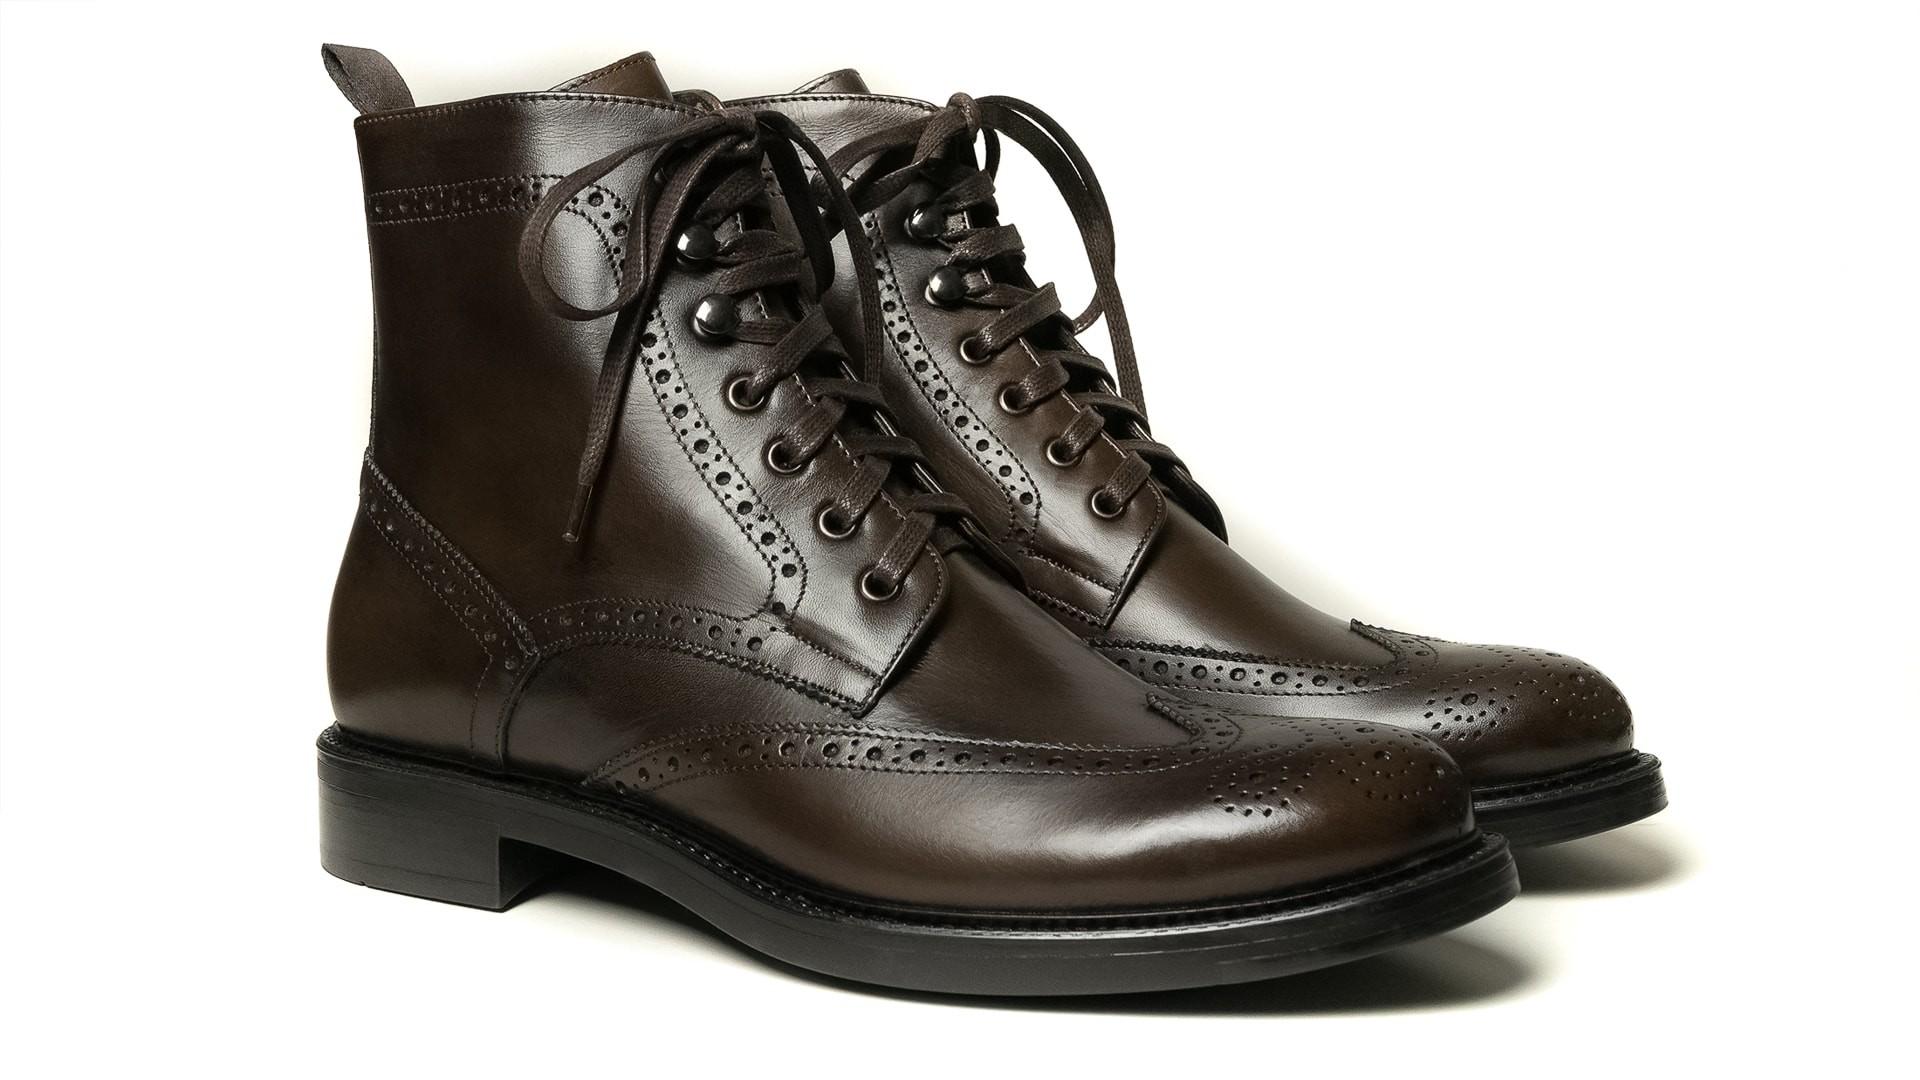 Brogue Boots Skóra Cielęca Espresso